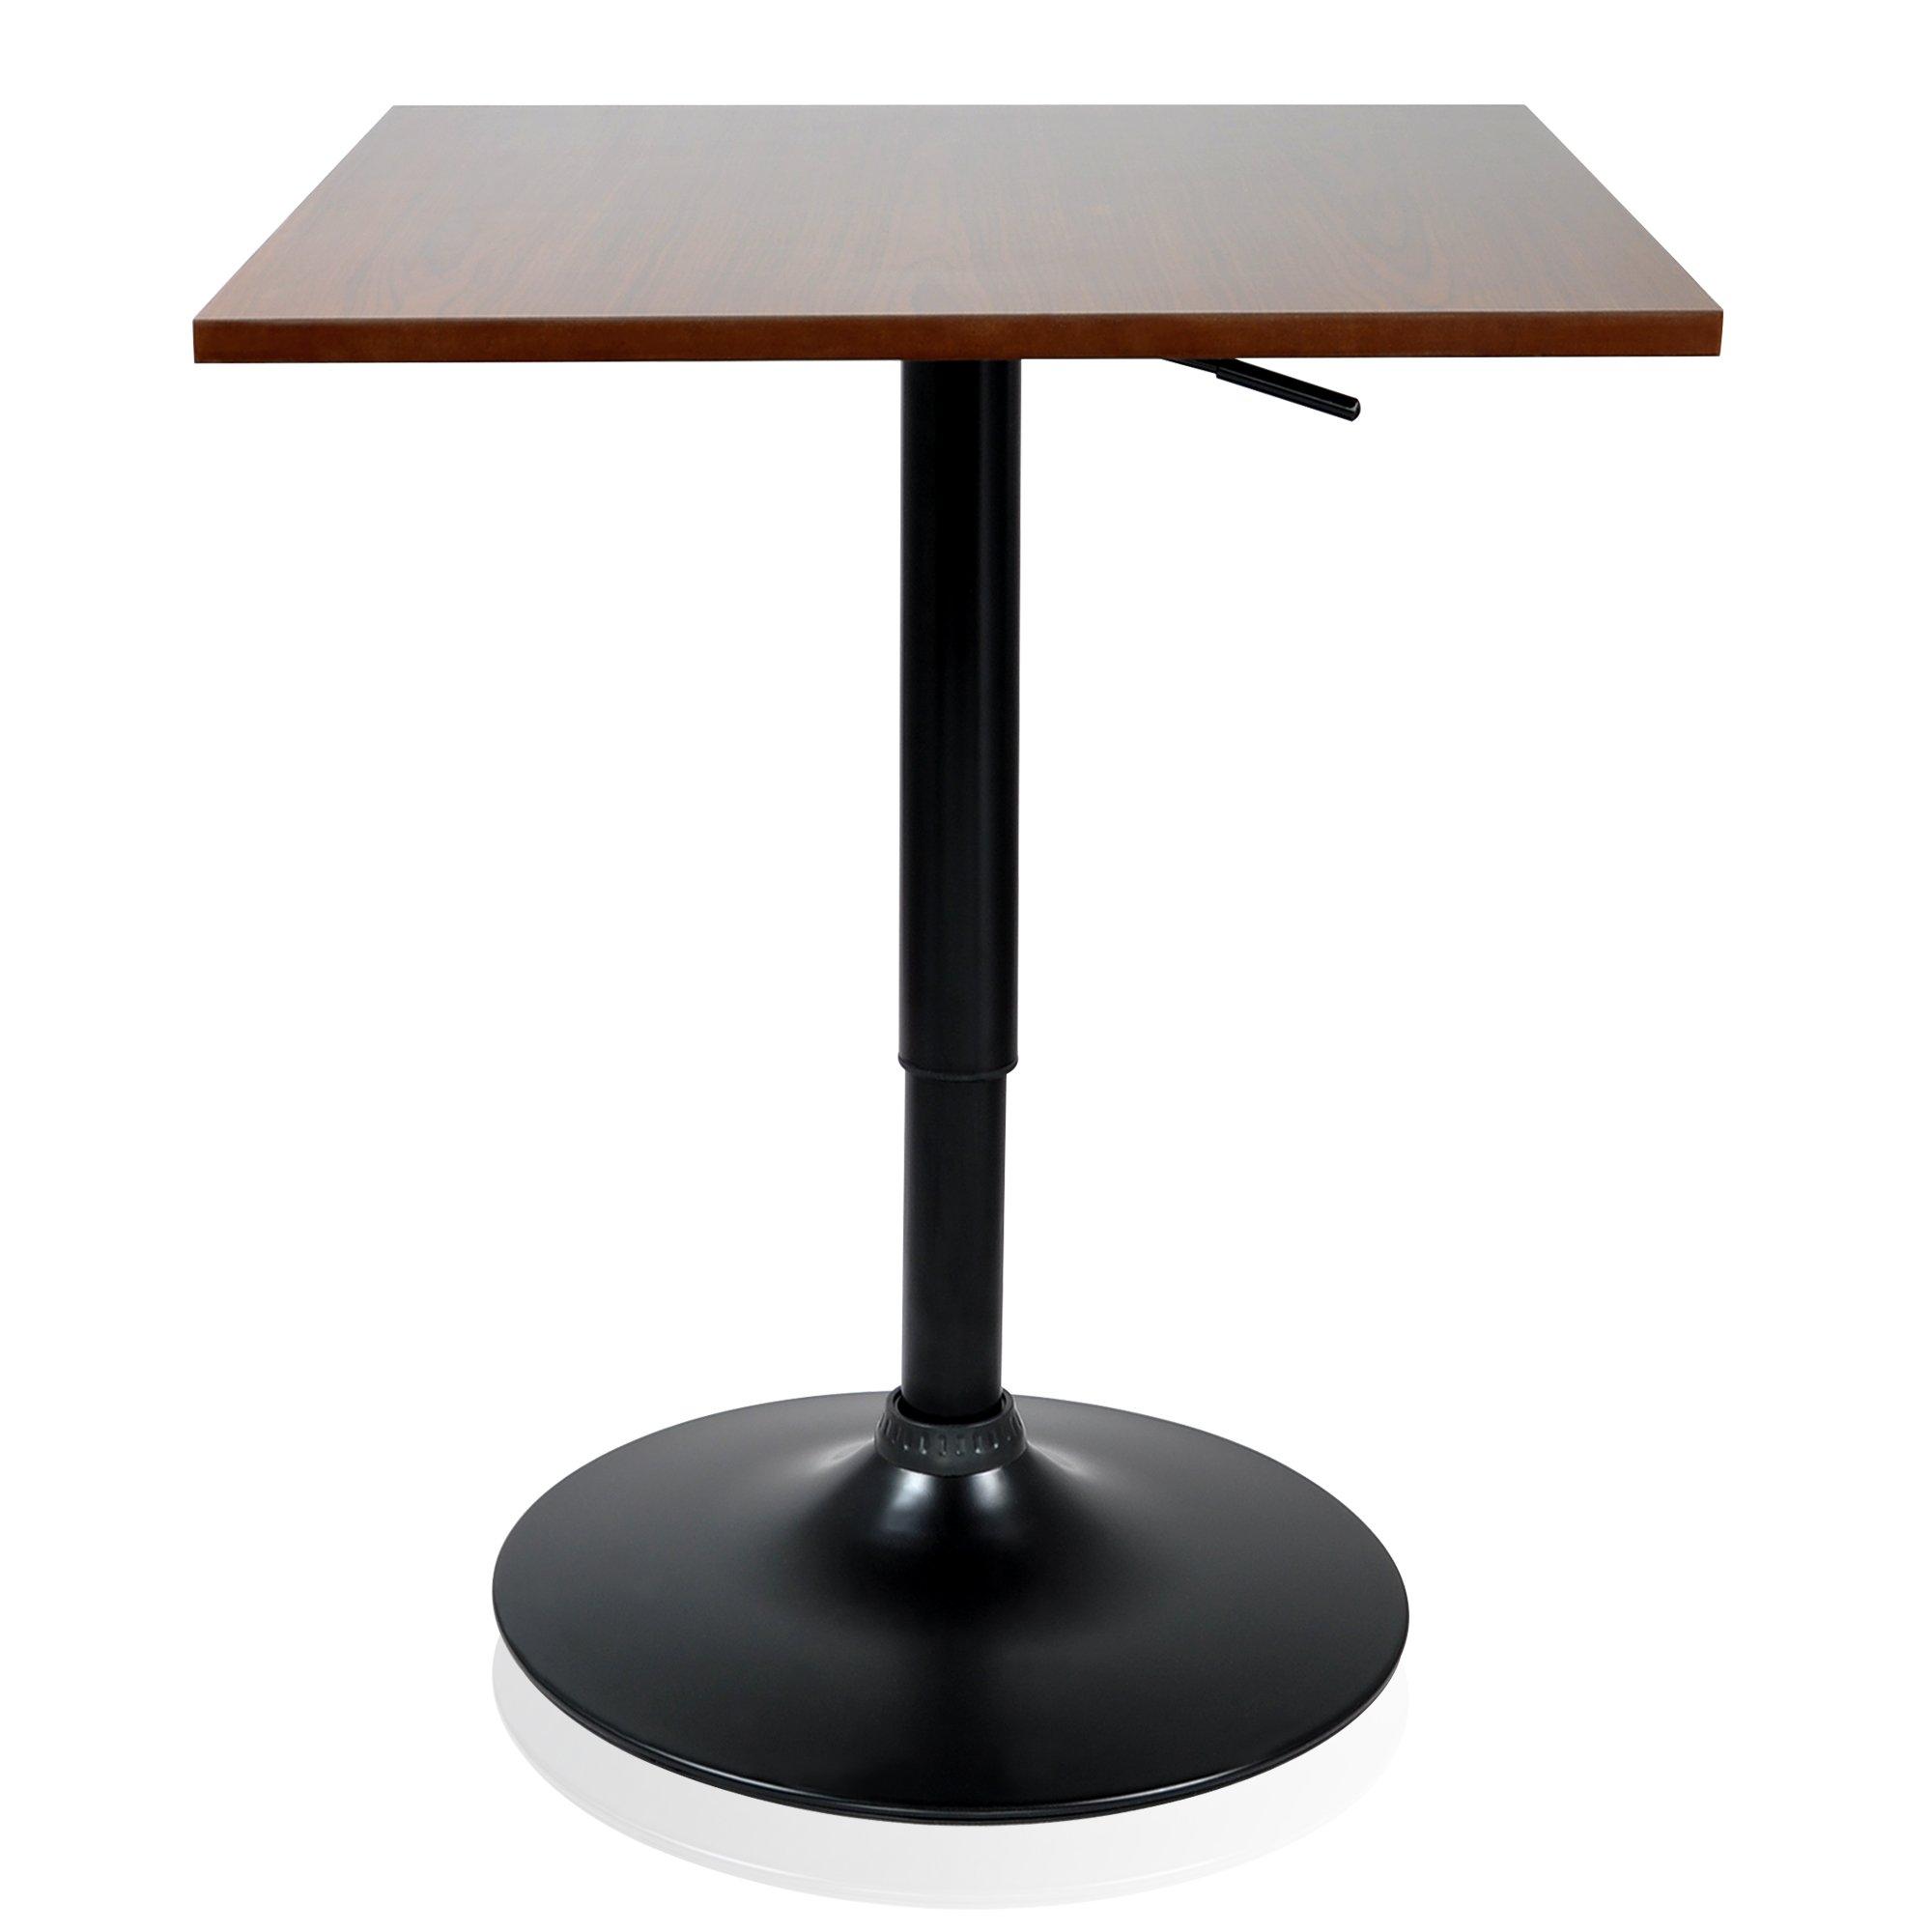 Krei Hejmo Adjustable Square Dining Cocktail Table with Metal Base VERŜO LINIO (Walnut, Square 23.6x23.6)